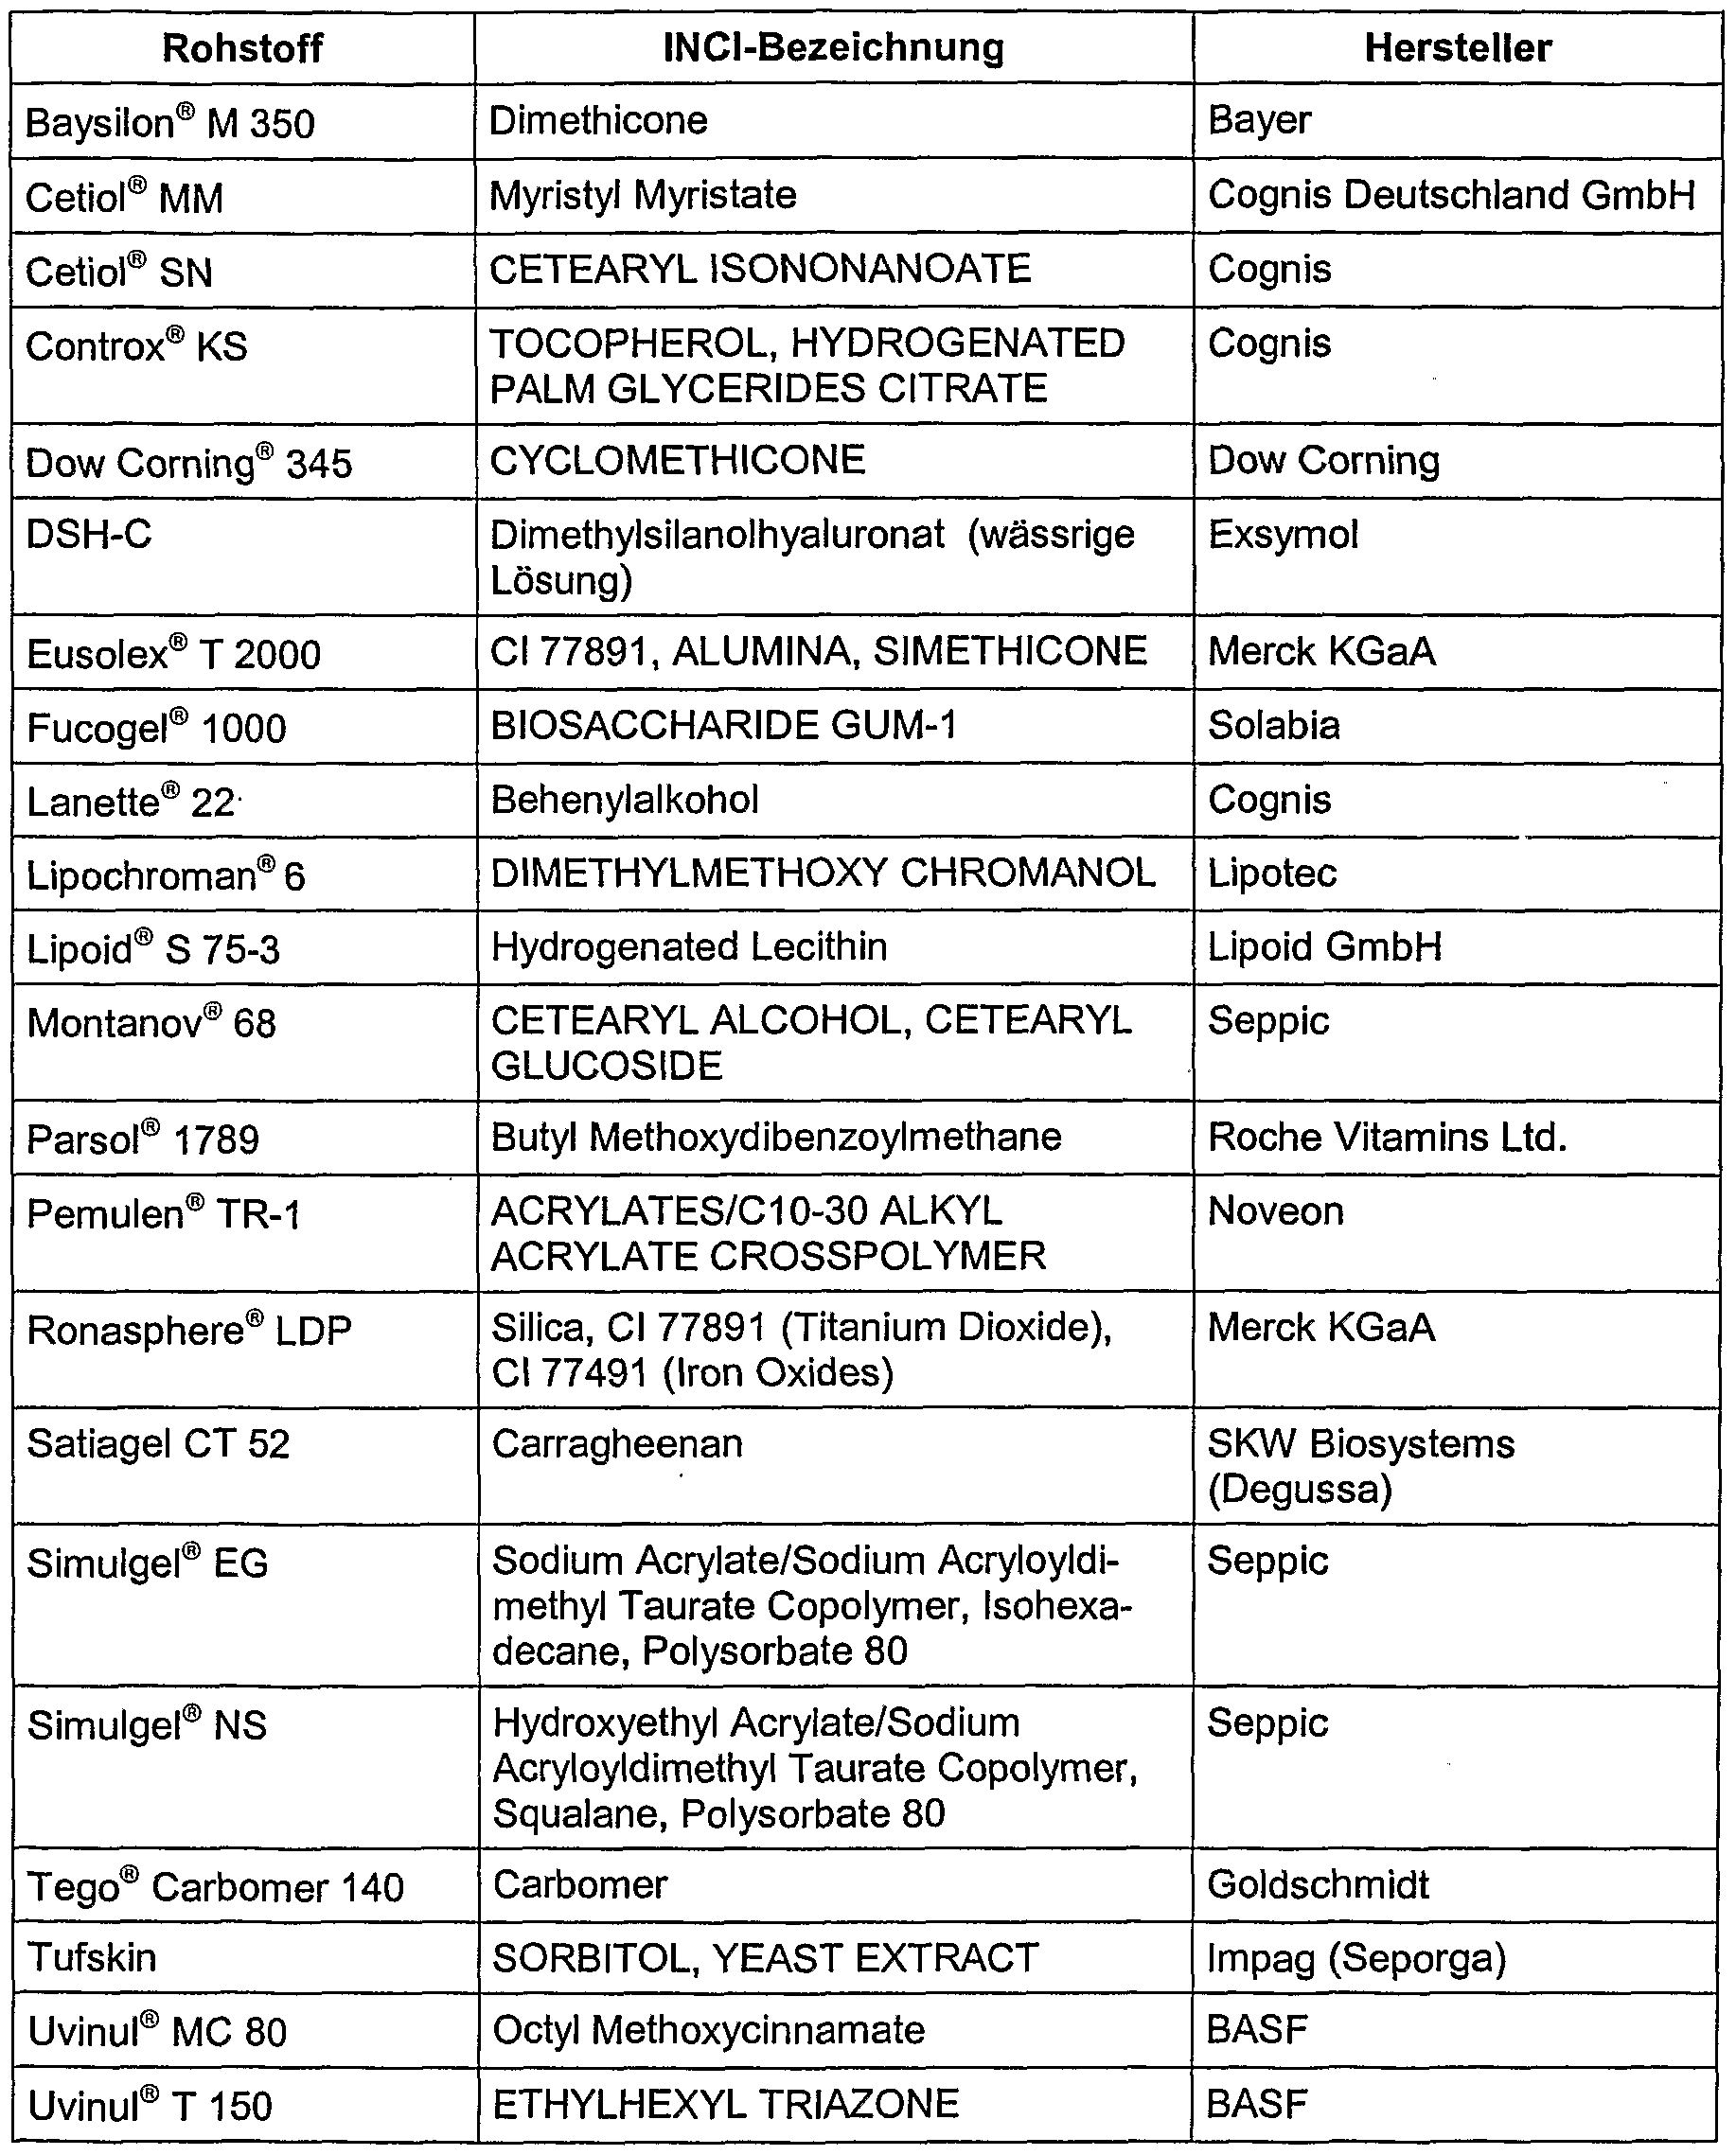 Hlb Werte Tabelle